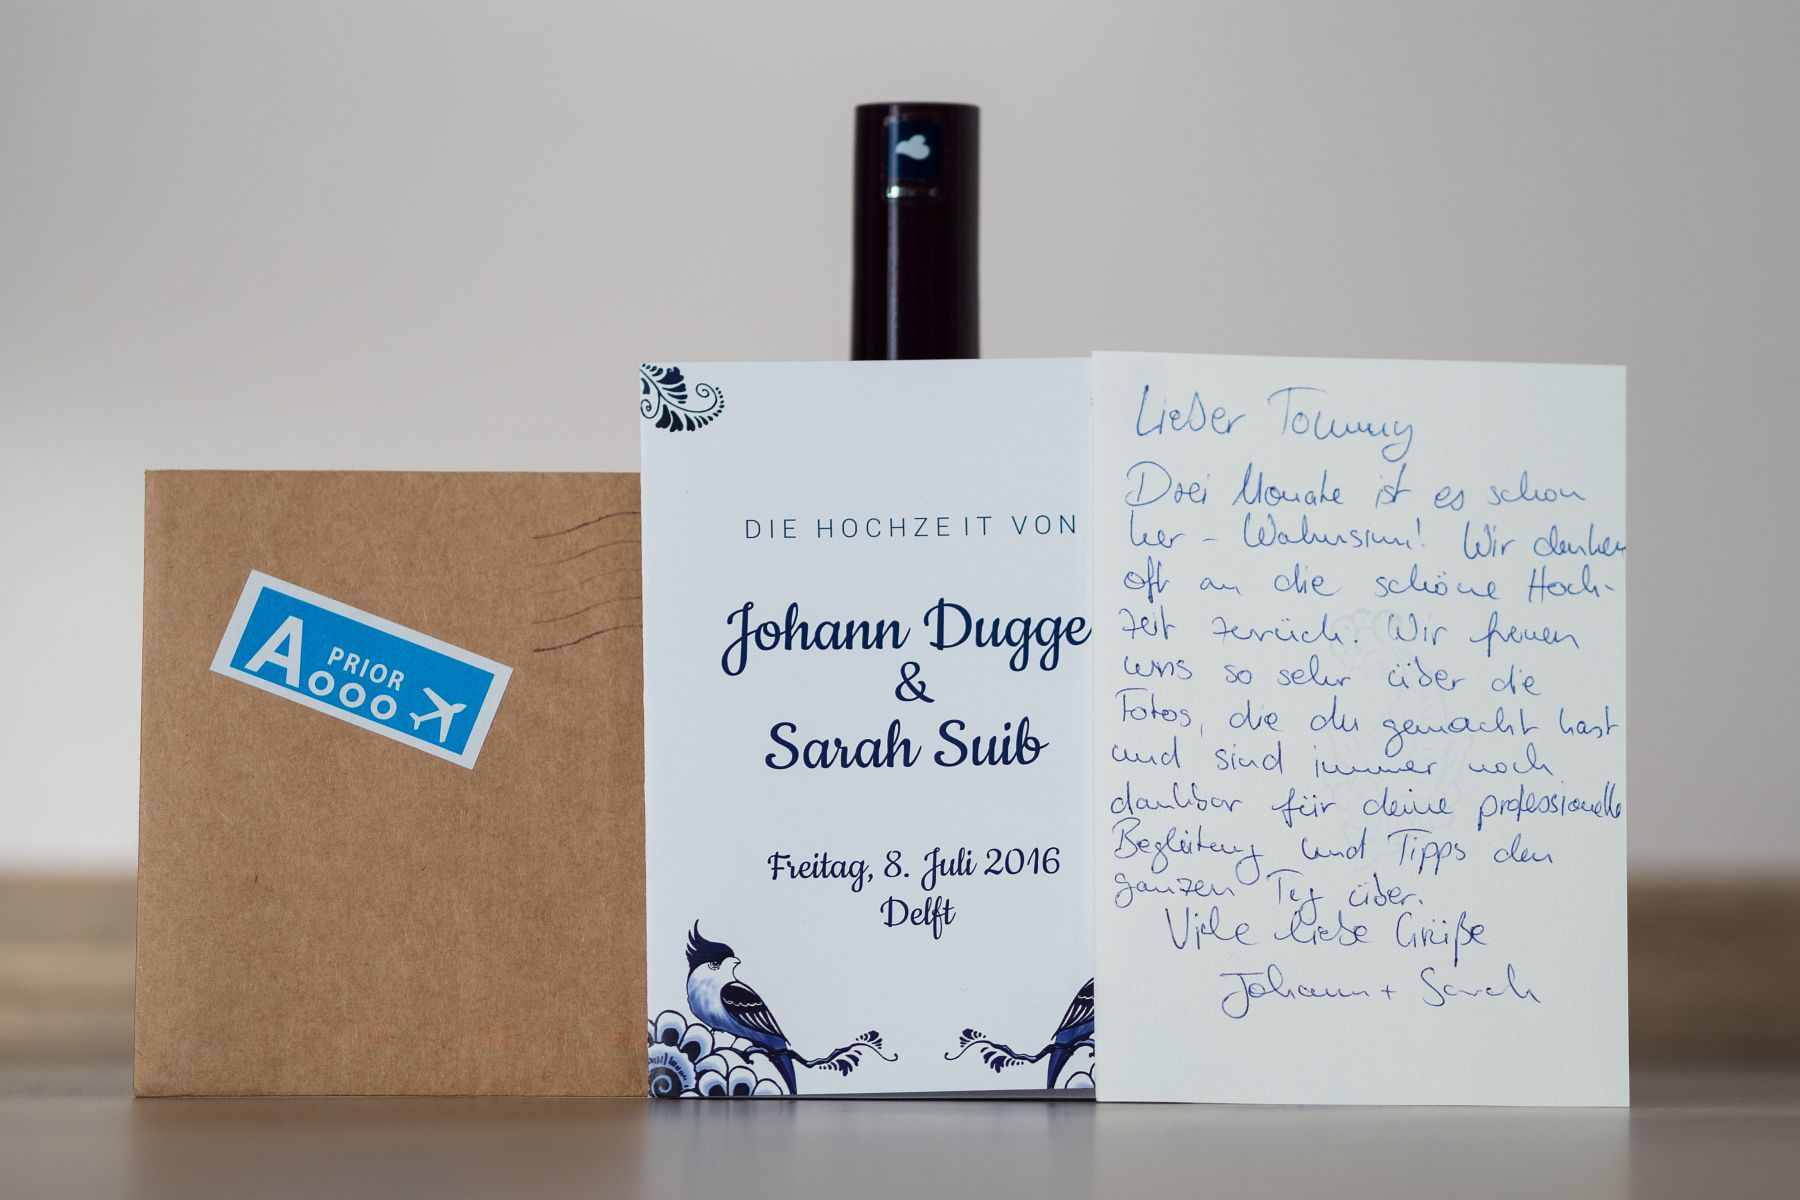 Danksagung von Sarah & Johann